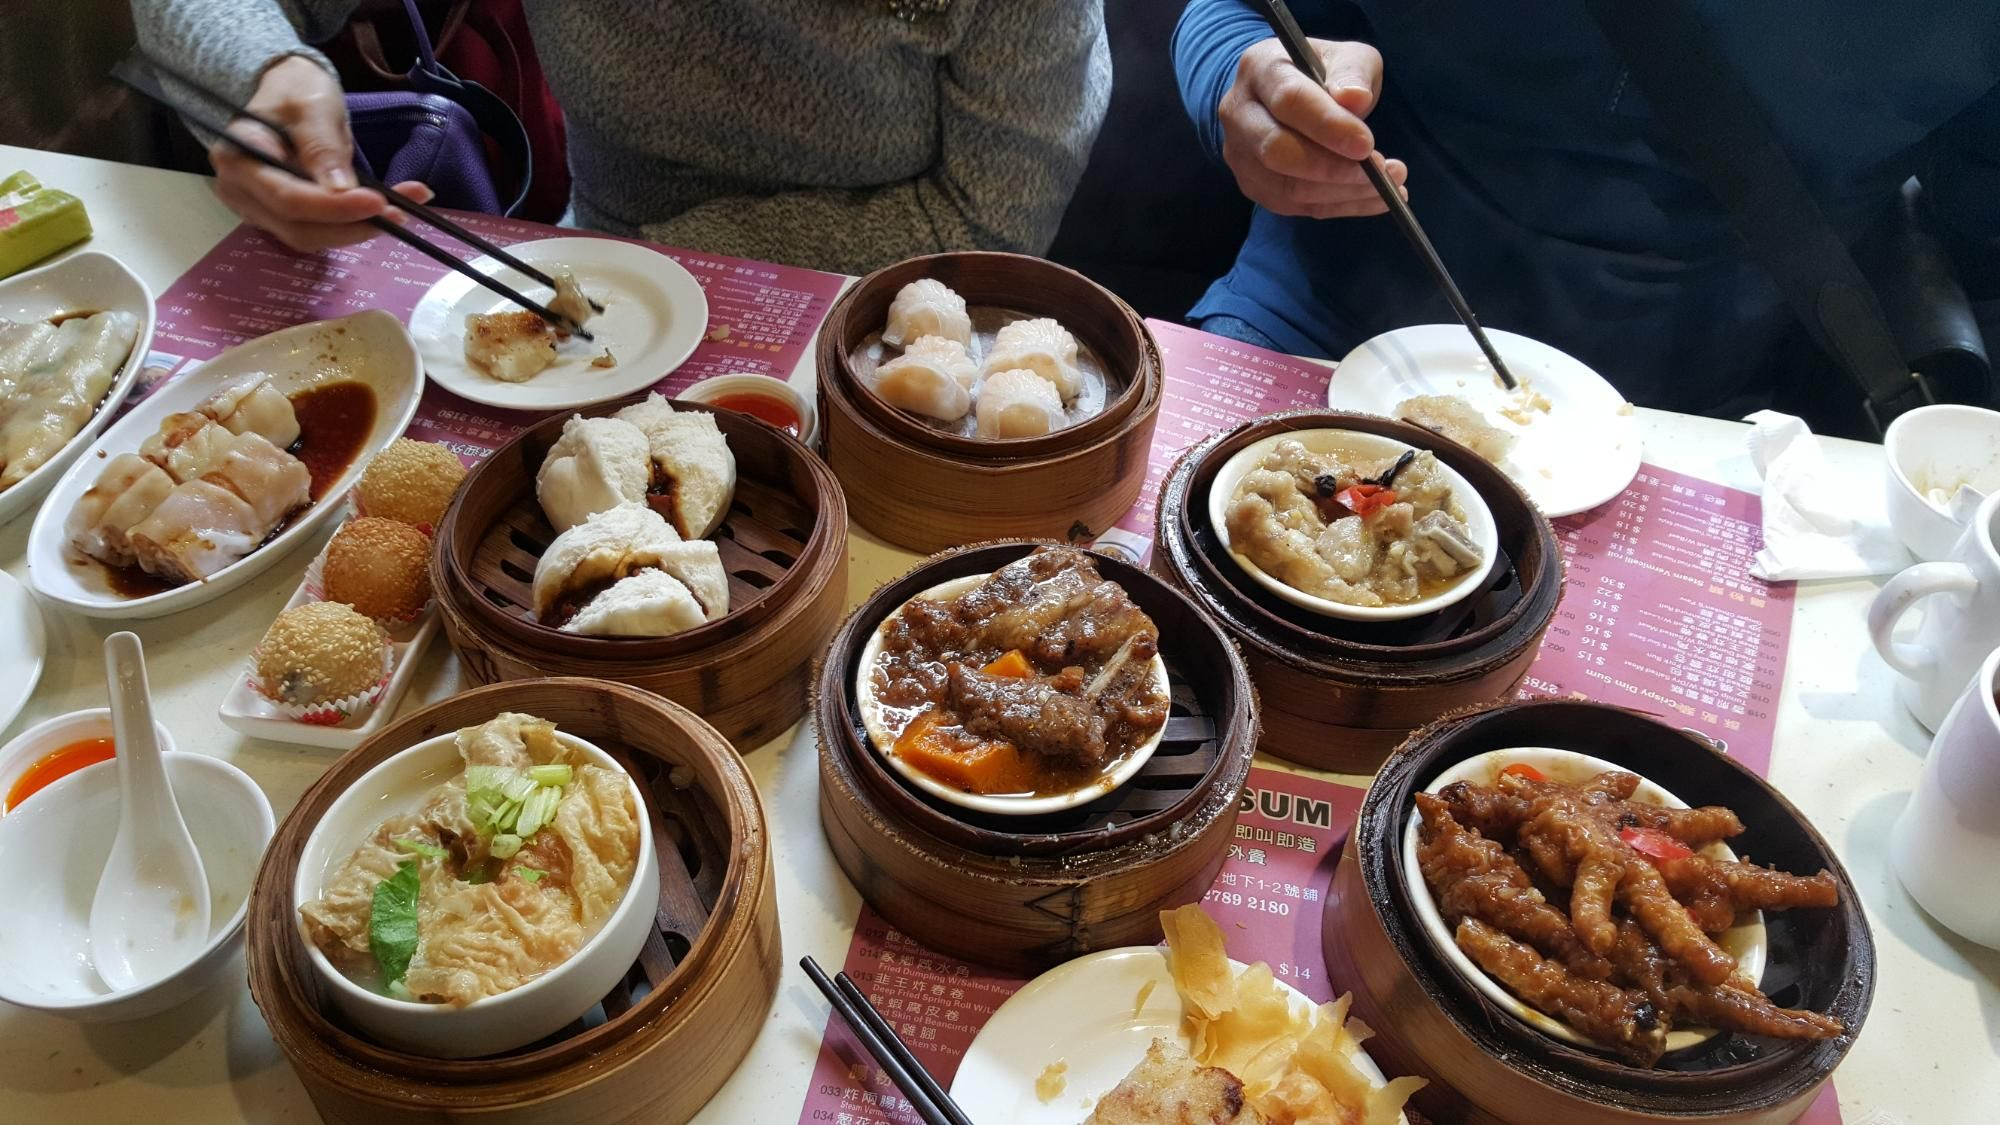 One Dim Sum Chinese Restaurant Dim Sum Food Pork Buns